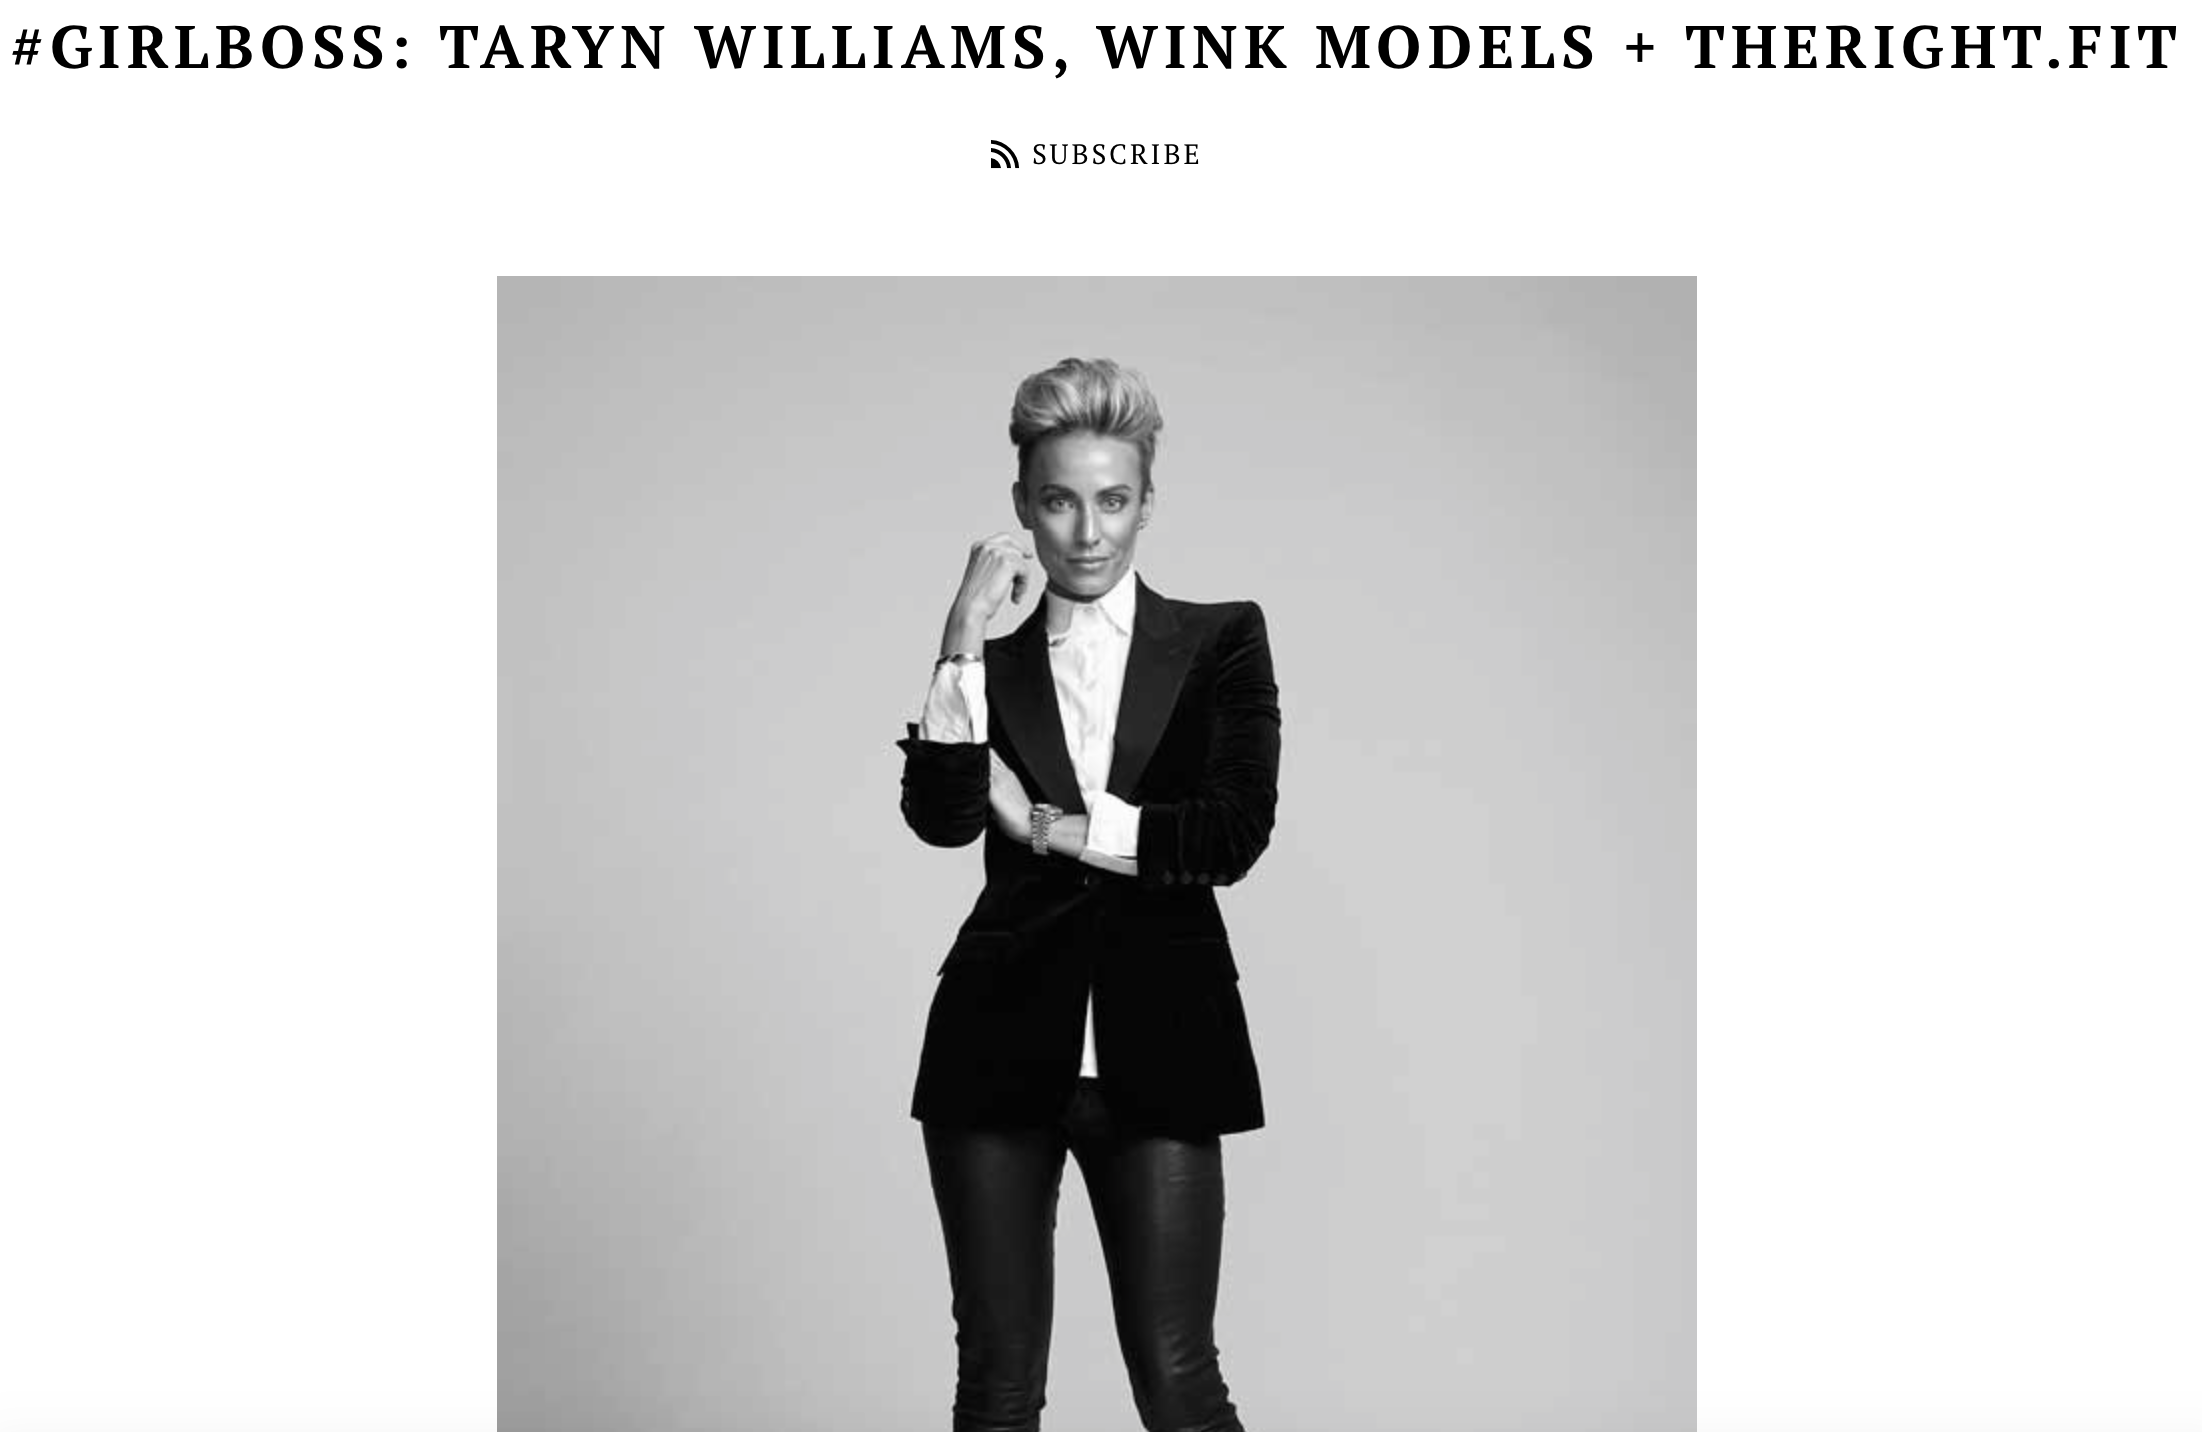 https://www.rebelmuse.com.au/blogs/news/92397891-girlboss-taryn-williams-wink-models-theright-fit